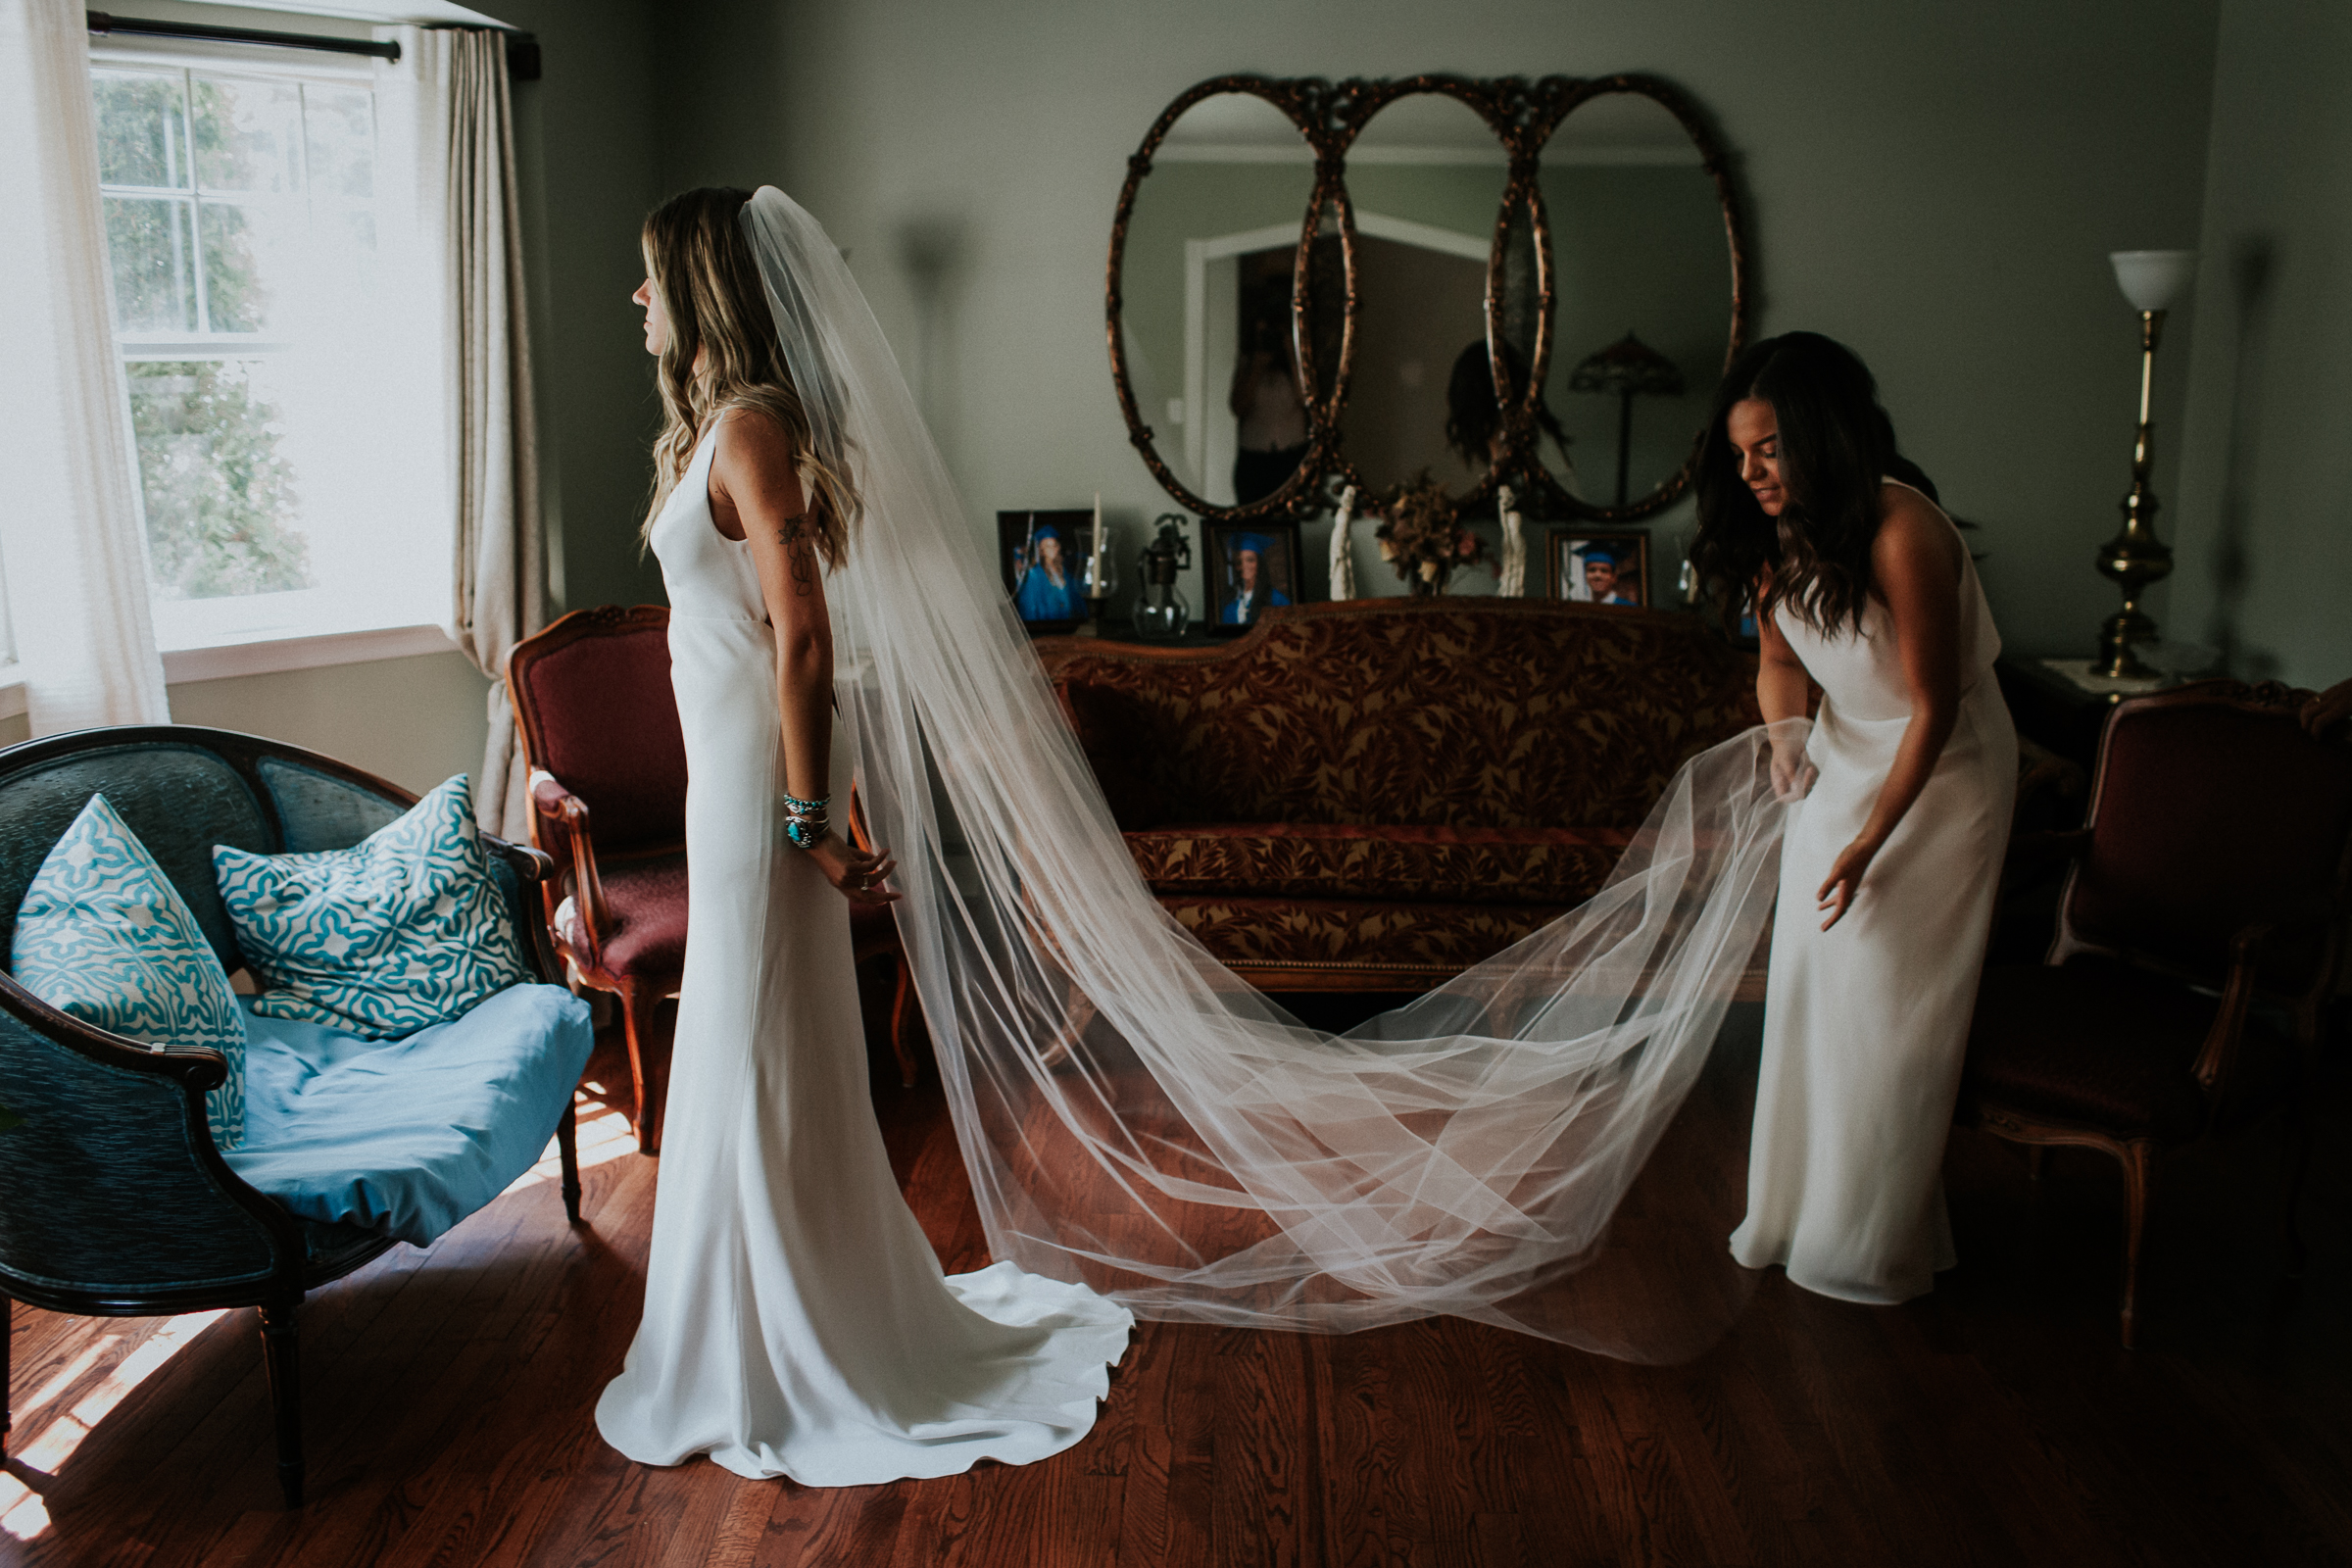 New-York-Documentary-Wedding-Photography-Best-Of-2017-by-Elvira-Kalviste-Photography-16.jpg